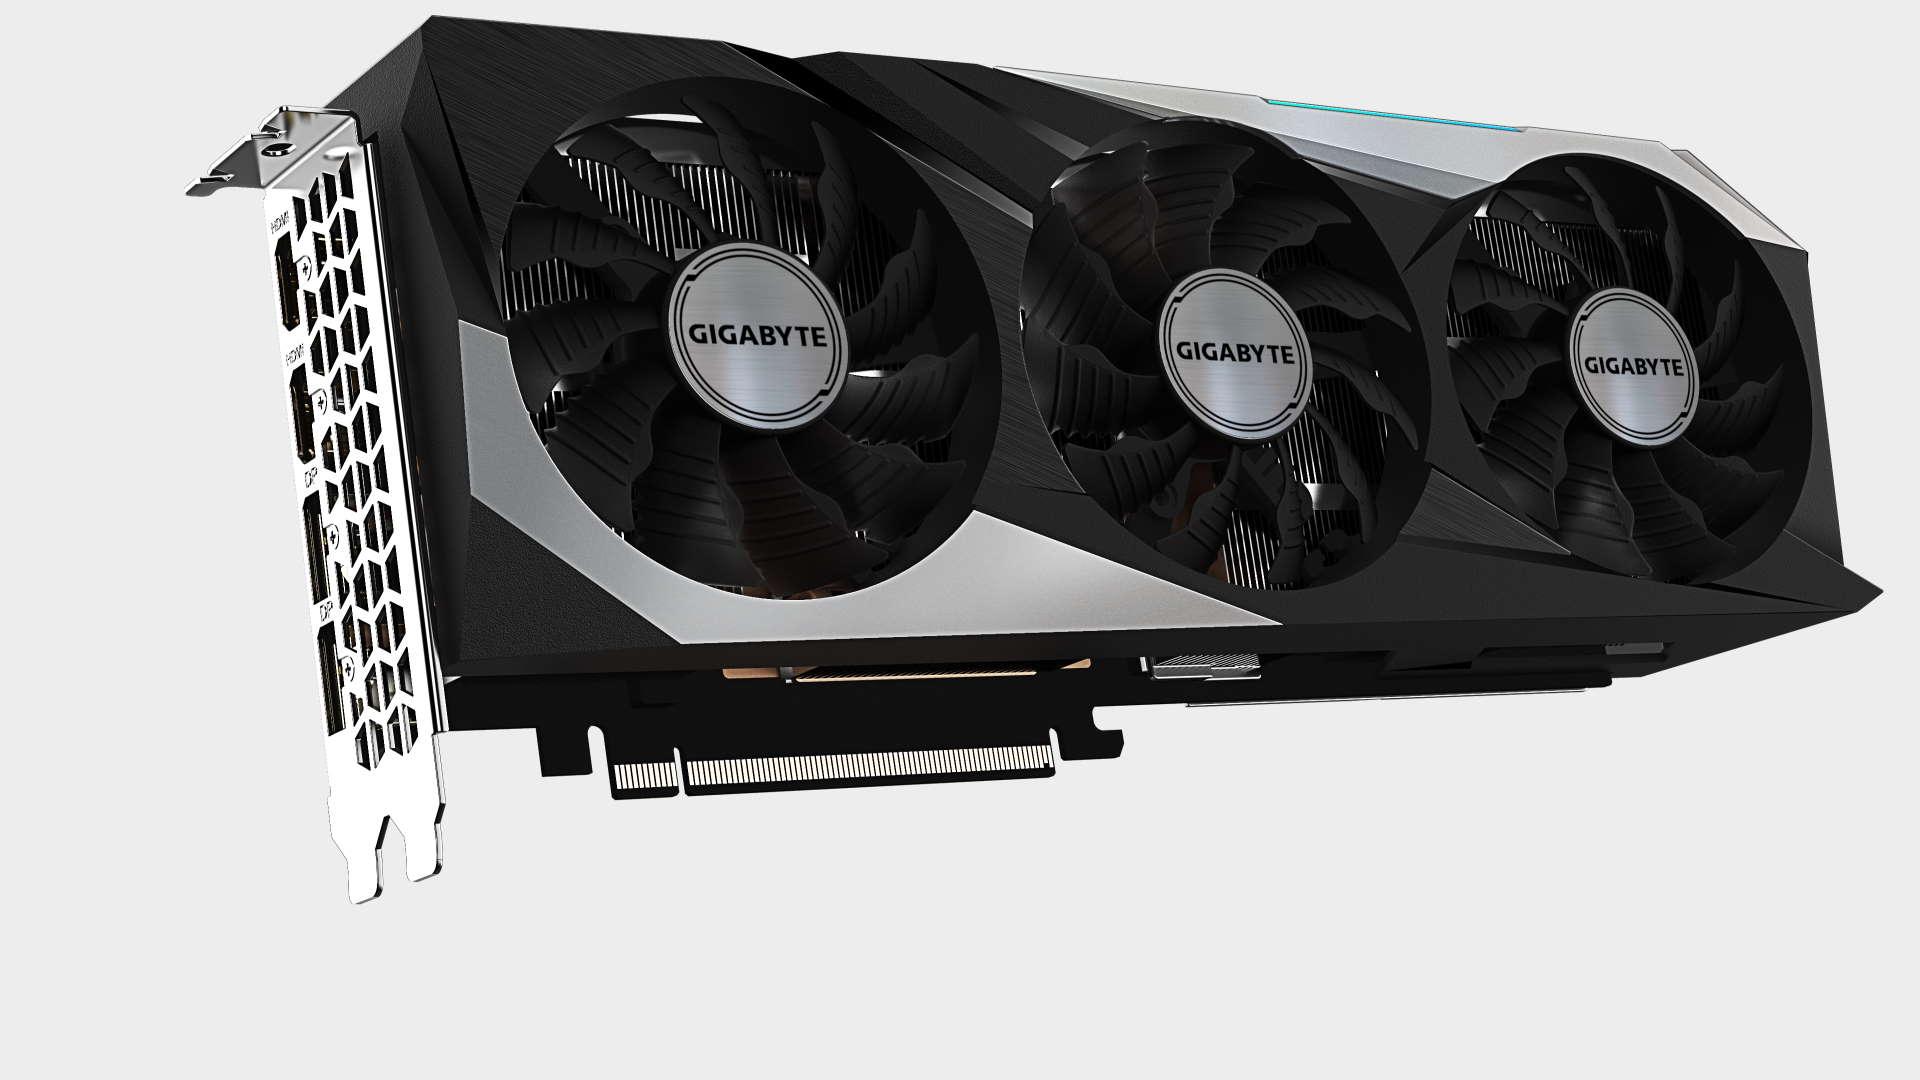 Gigabyte Radeon RX 6800 XT Gaming OC Review